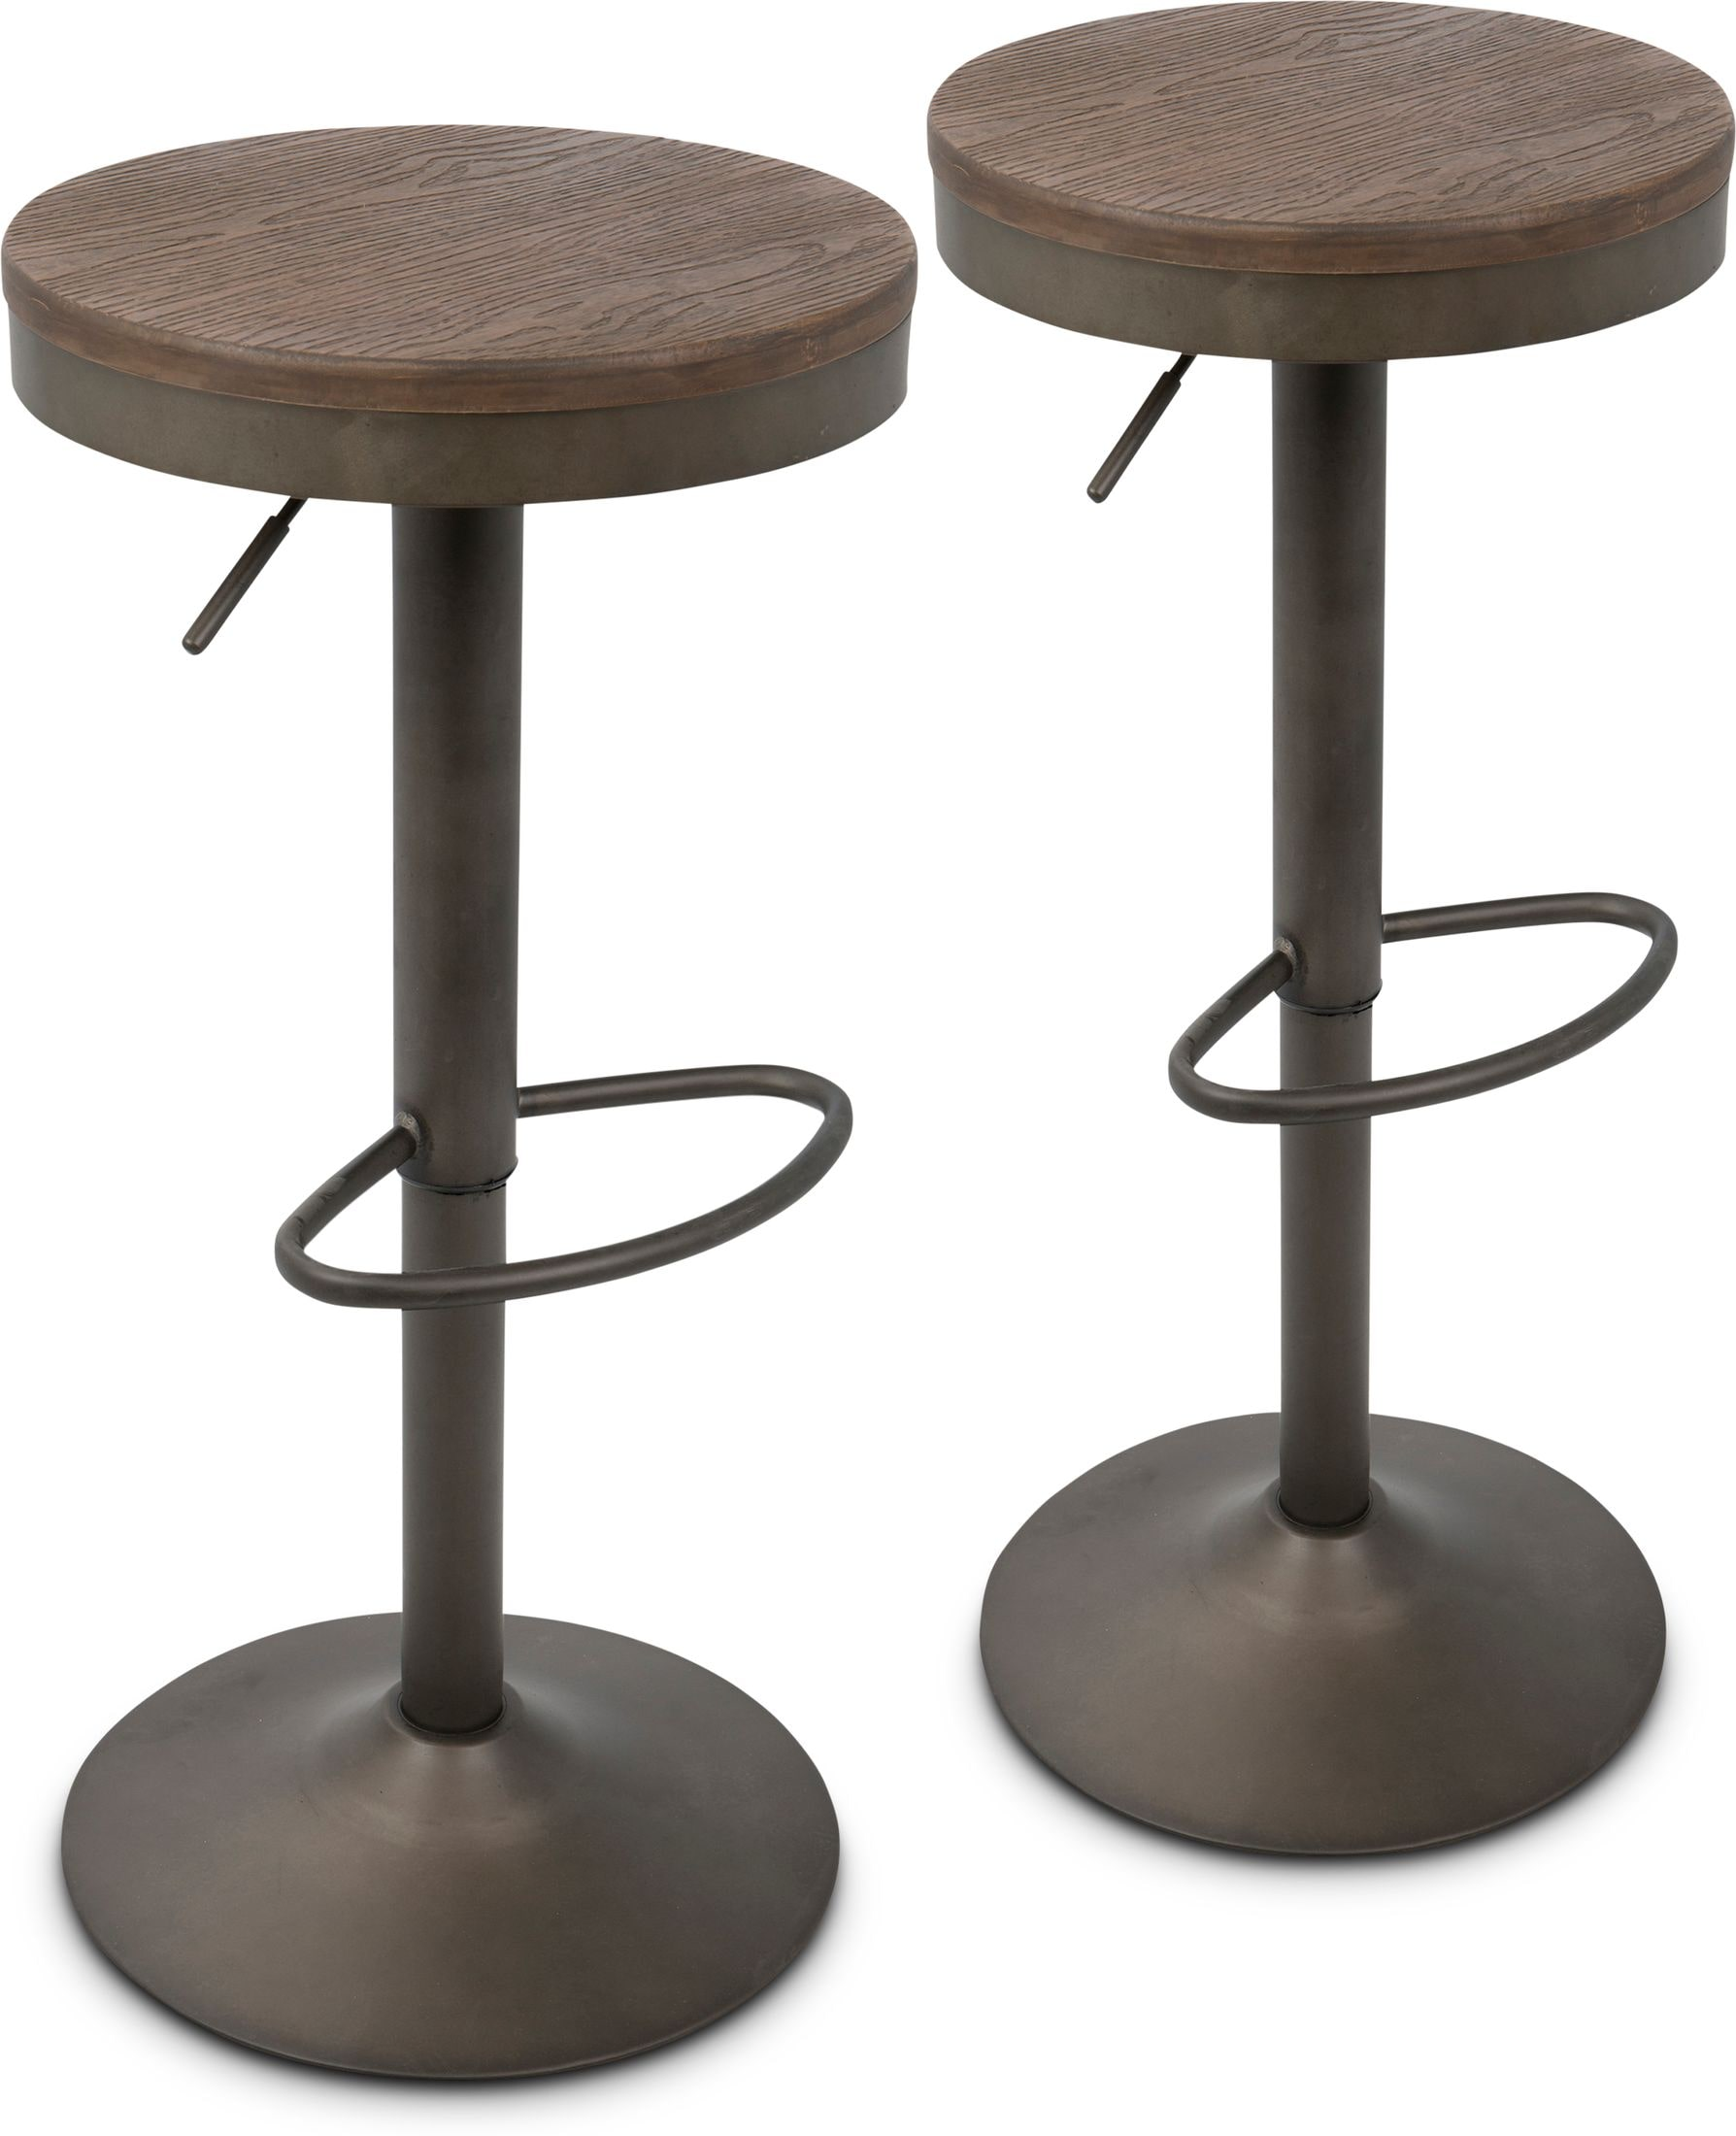 Dining Room Furniture - Noa Set of 2 Adjustable Swivel Bar Stools